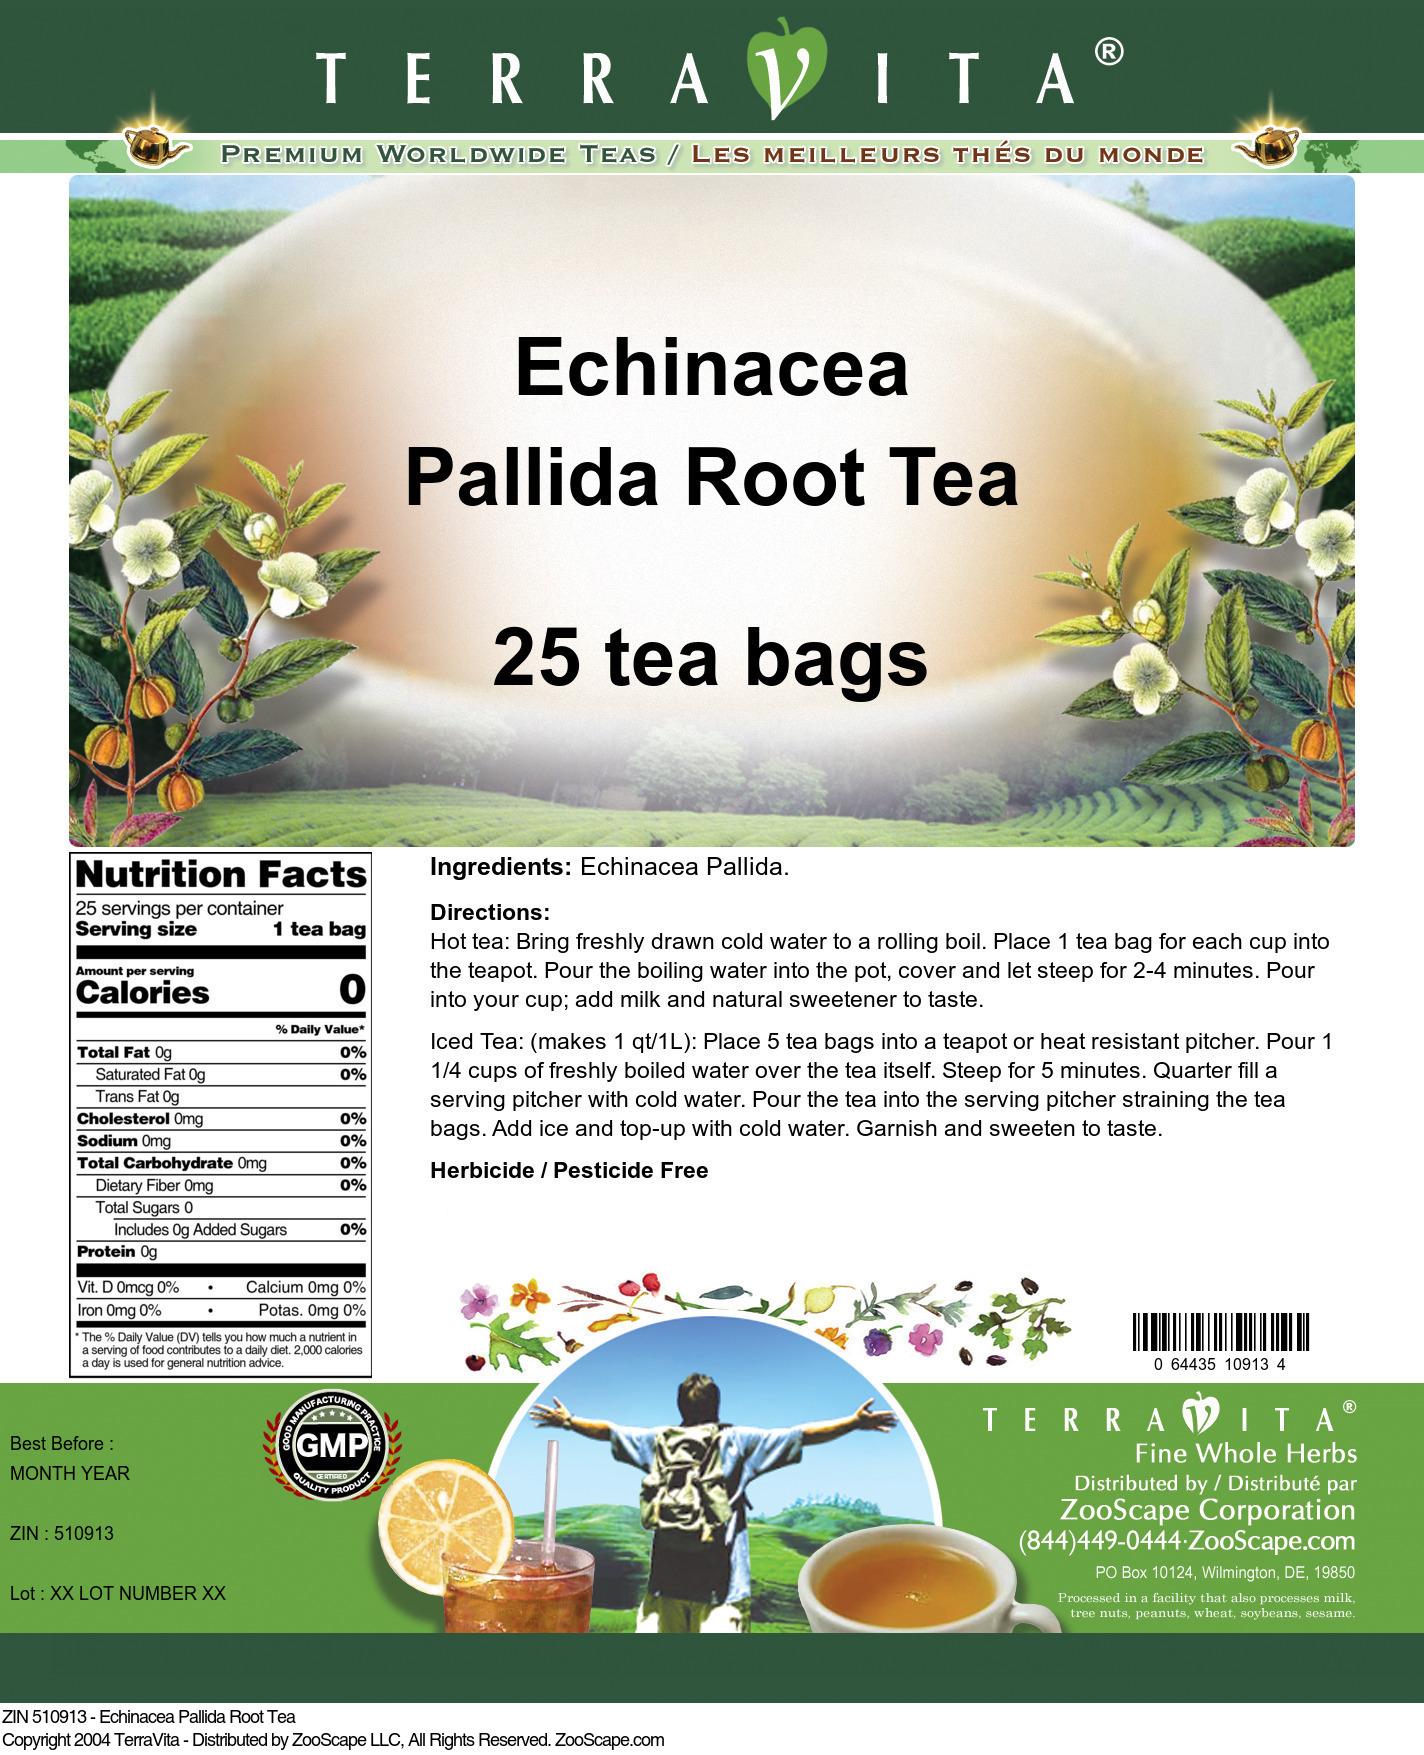 Echinacea Pallida Root Tea